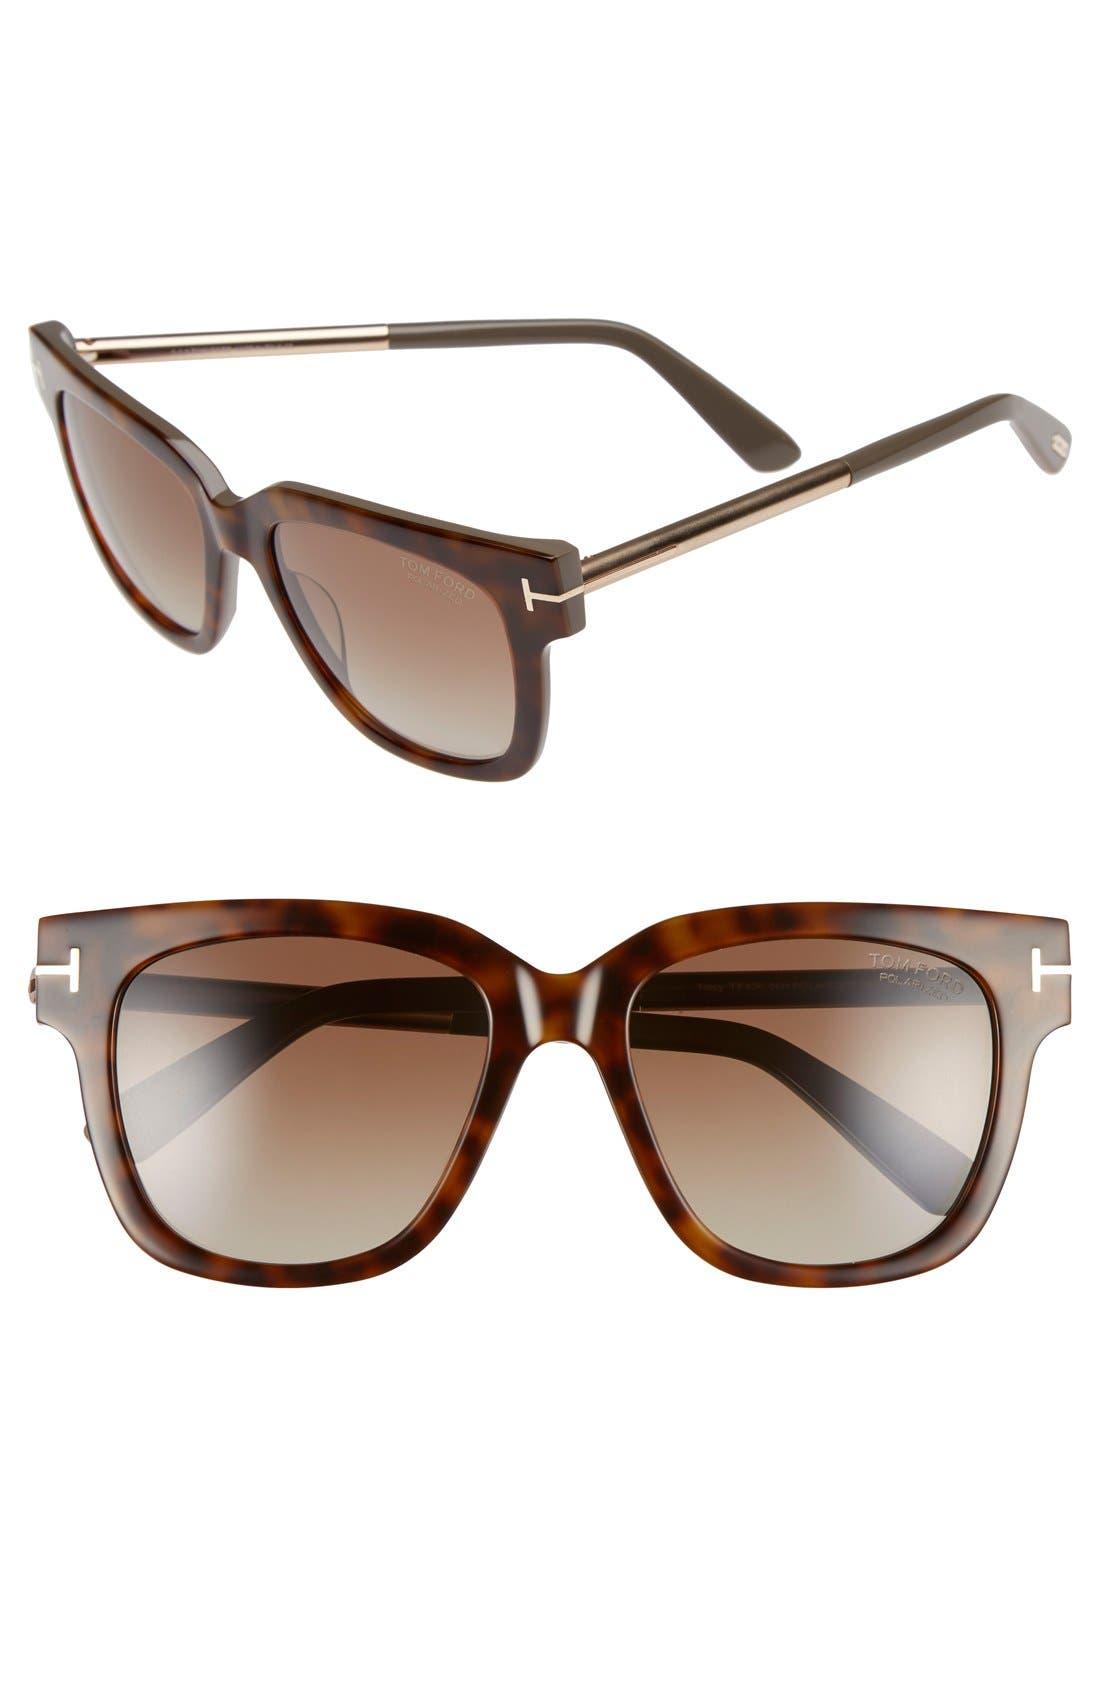 Main Image - Tom Ford 'Tracy' 53mm Retro Sunglasses